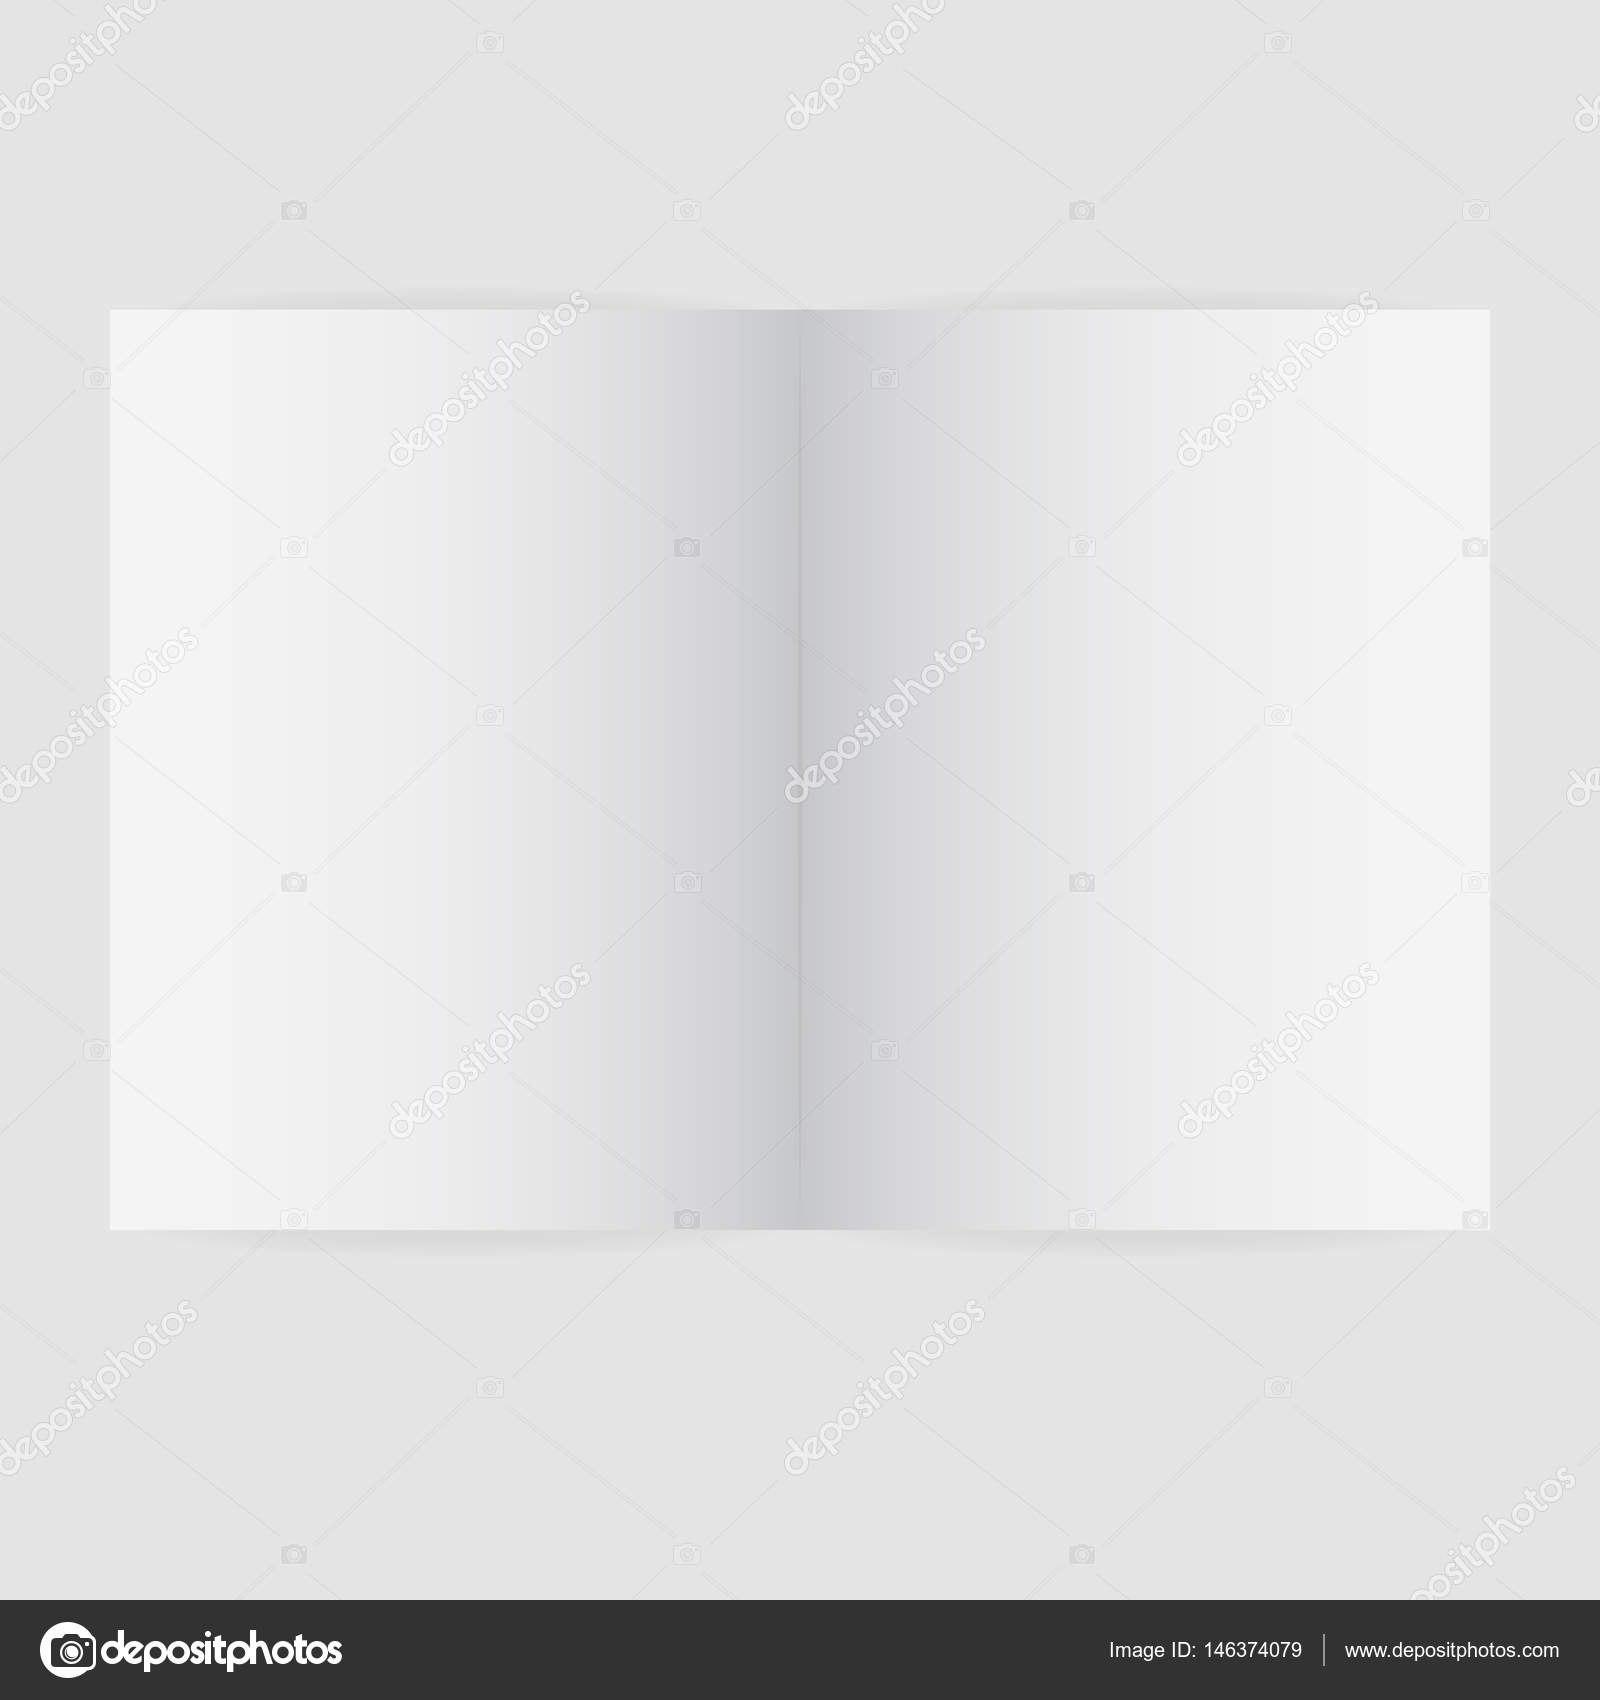 Blank Magazine Spread Template Vector Illustration — Stock Vector With Regard To Blank Magazine Spread Template